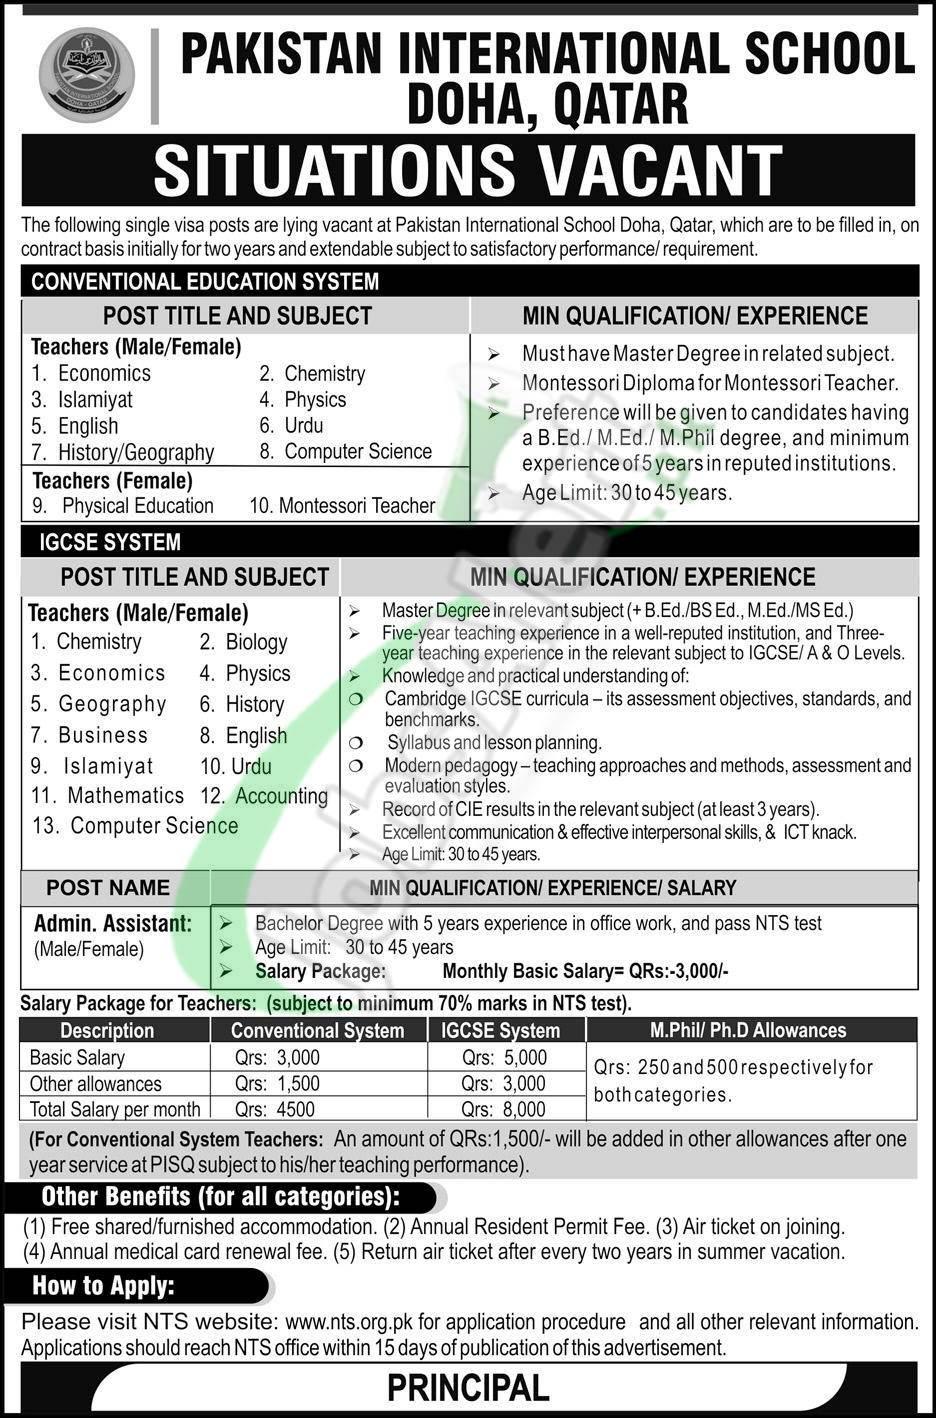 Pakistan International School Doha Qatar Jobs 2019